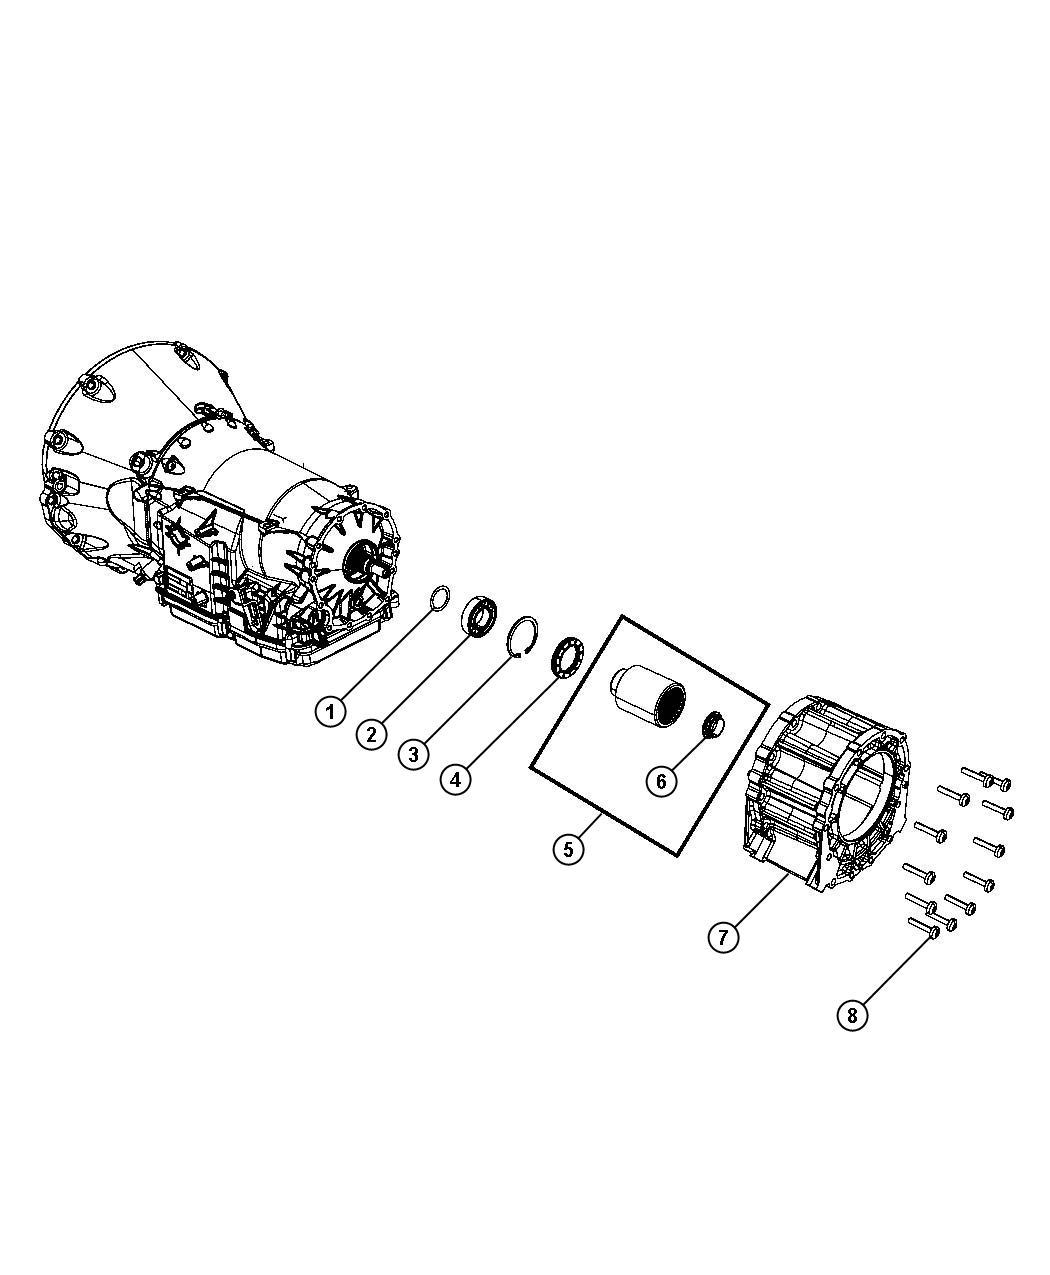 Jeep Grand Cherokee Adapter Transfer Case